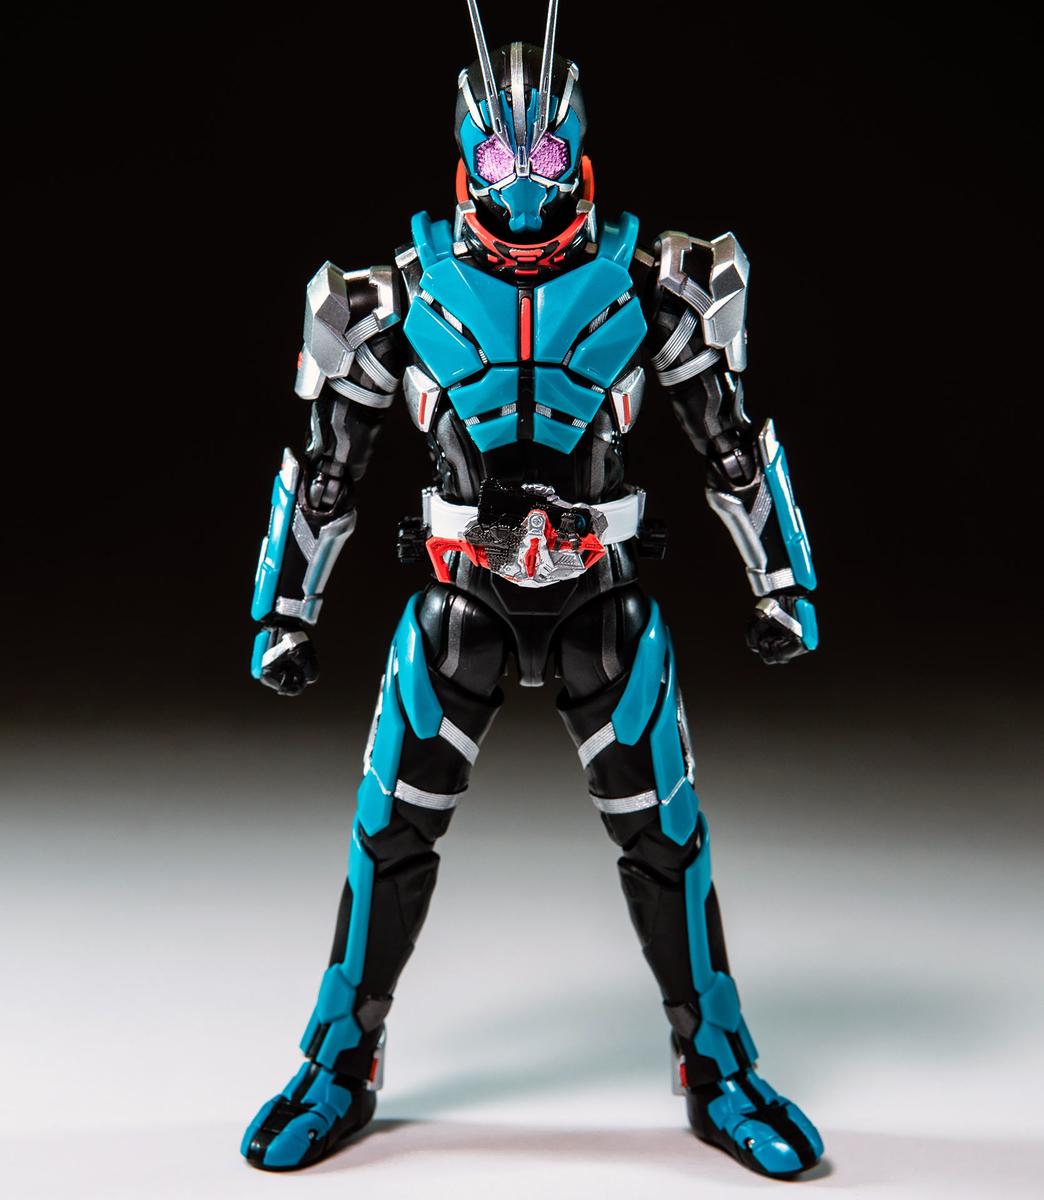 f:id:hiroban-ch:20210620025857j:plain